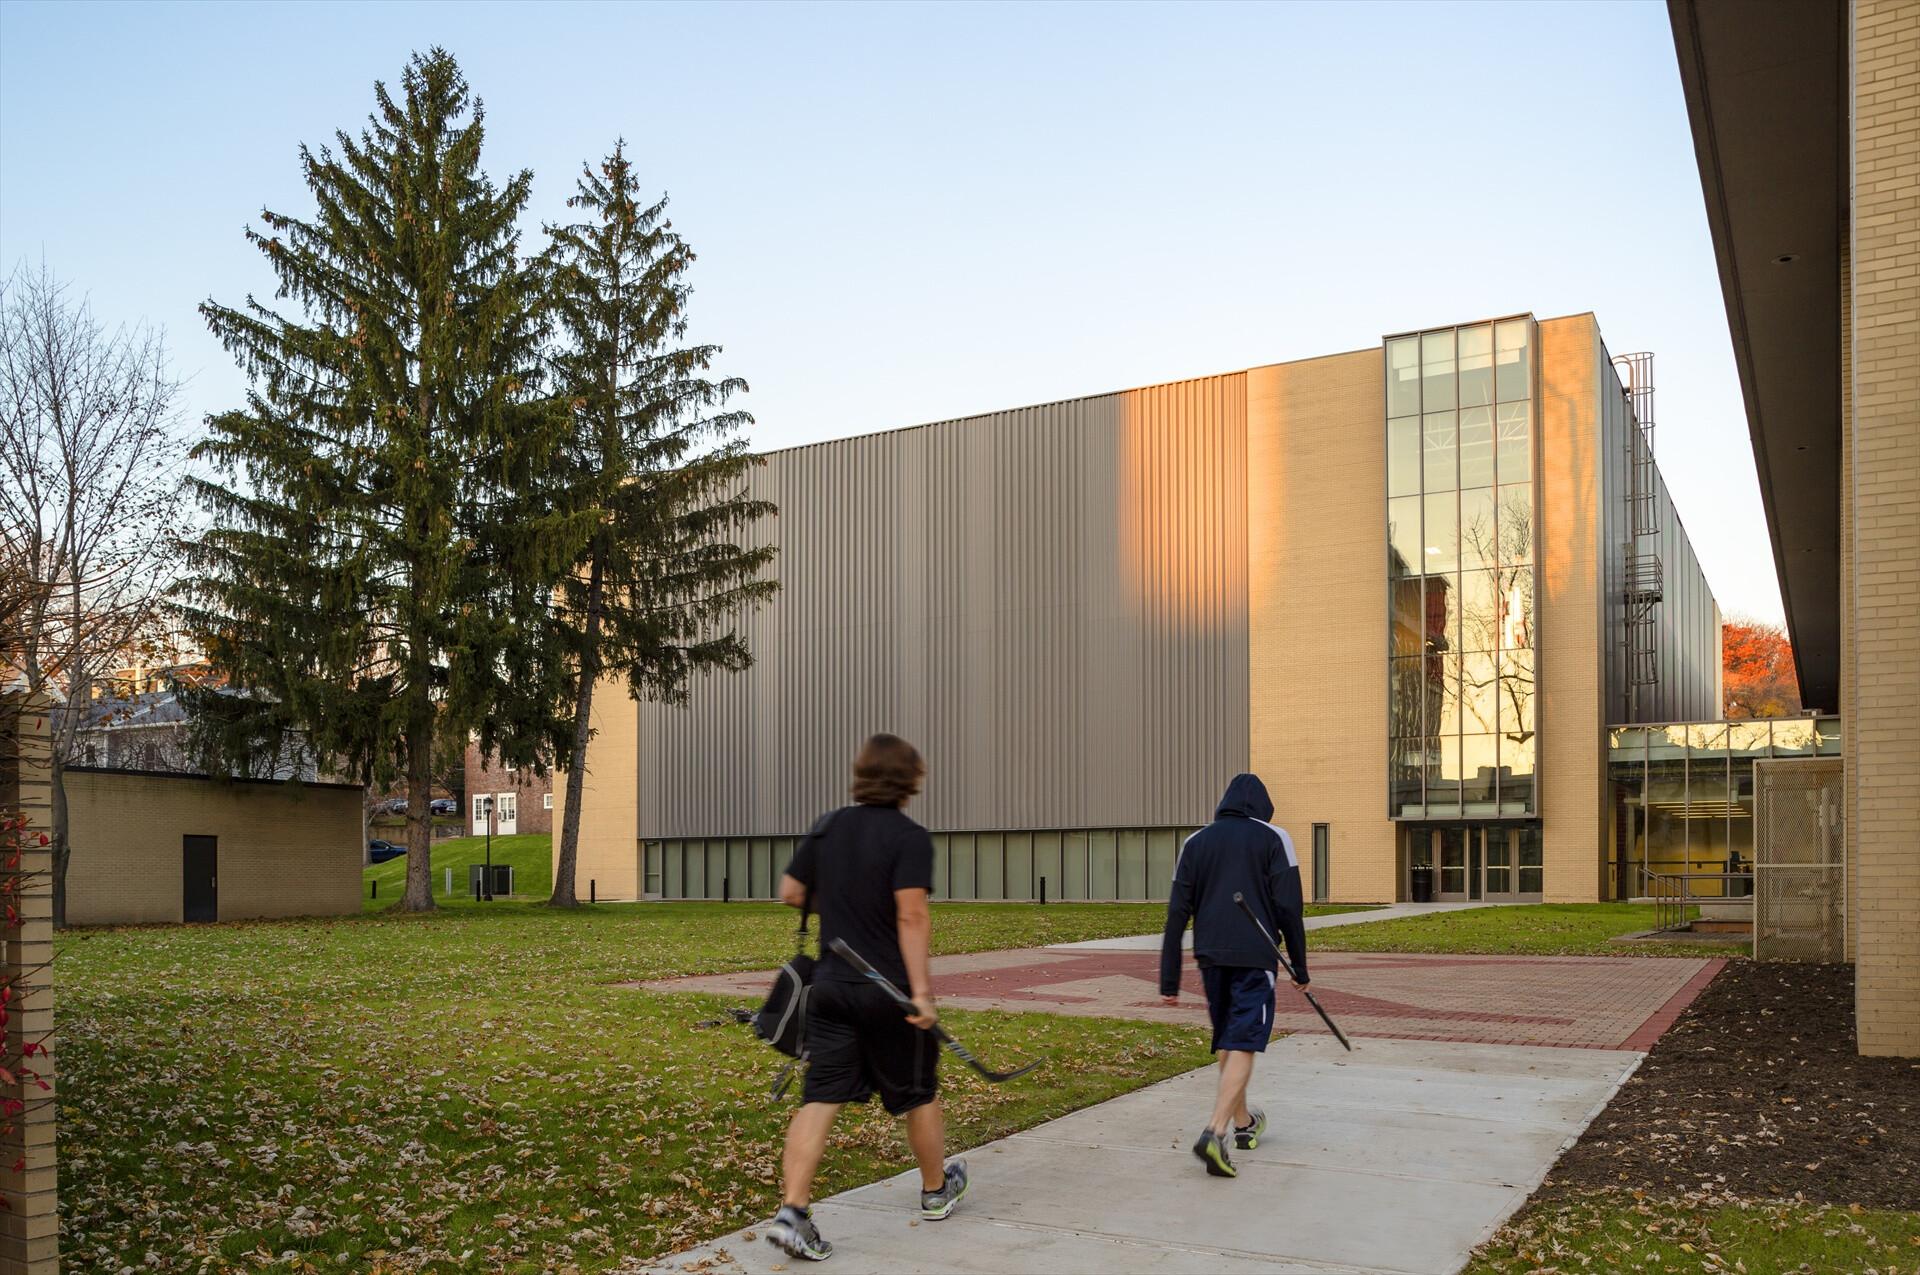 Scandlon Gymnasium at King's College